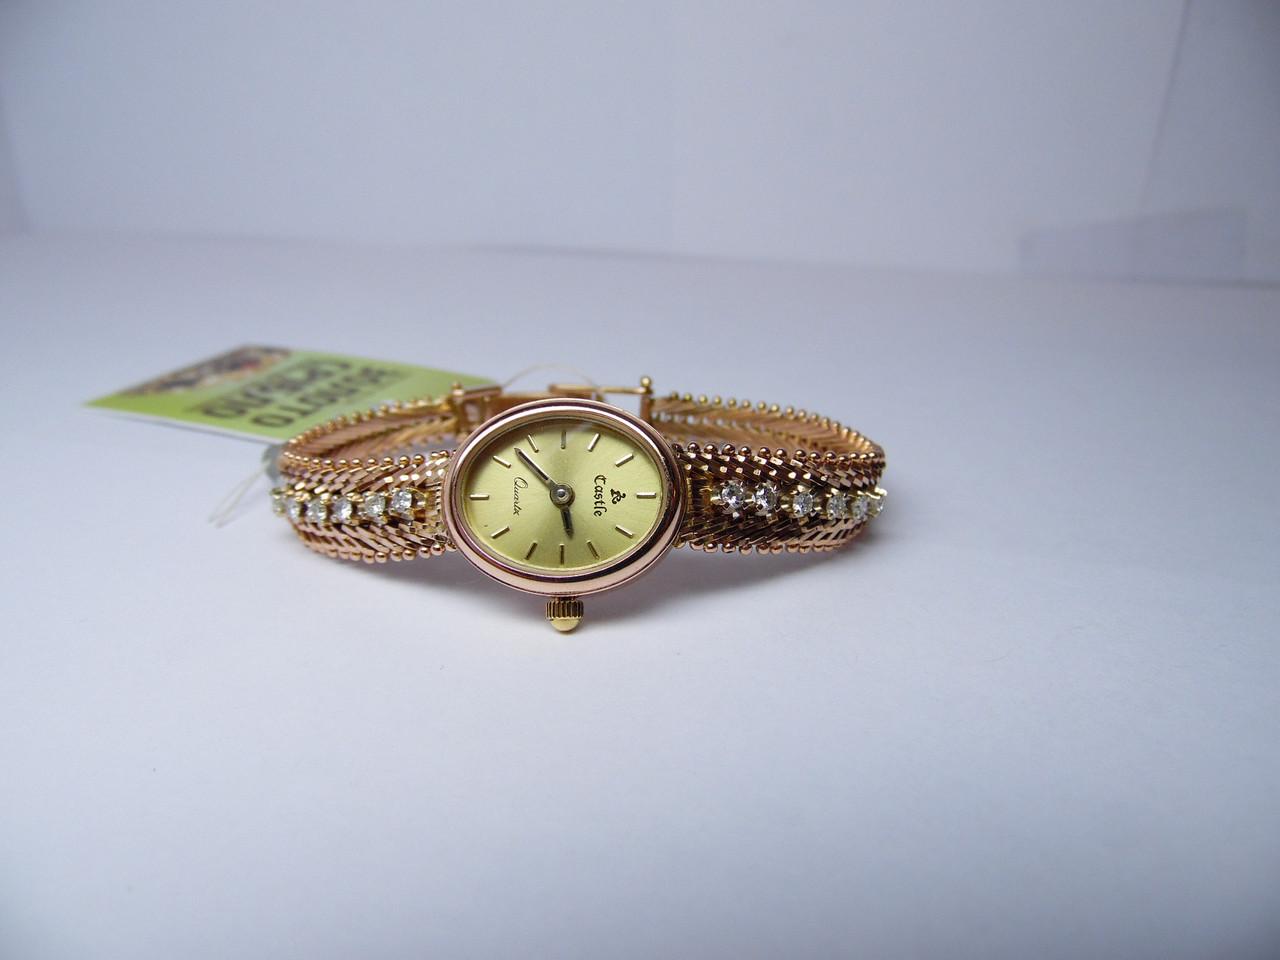 f71b66ec Золотые женские часы с бриллиантами - Комісійний магазин